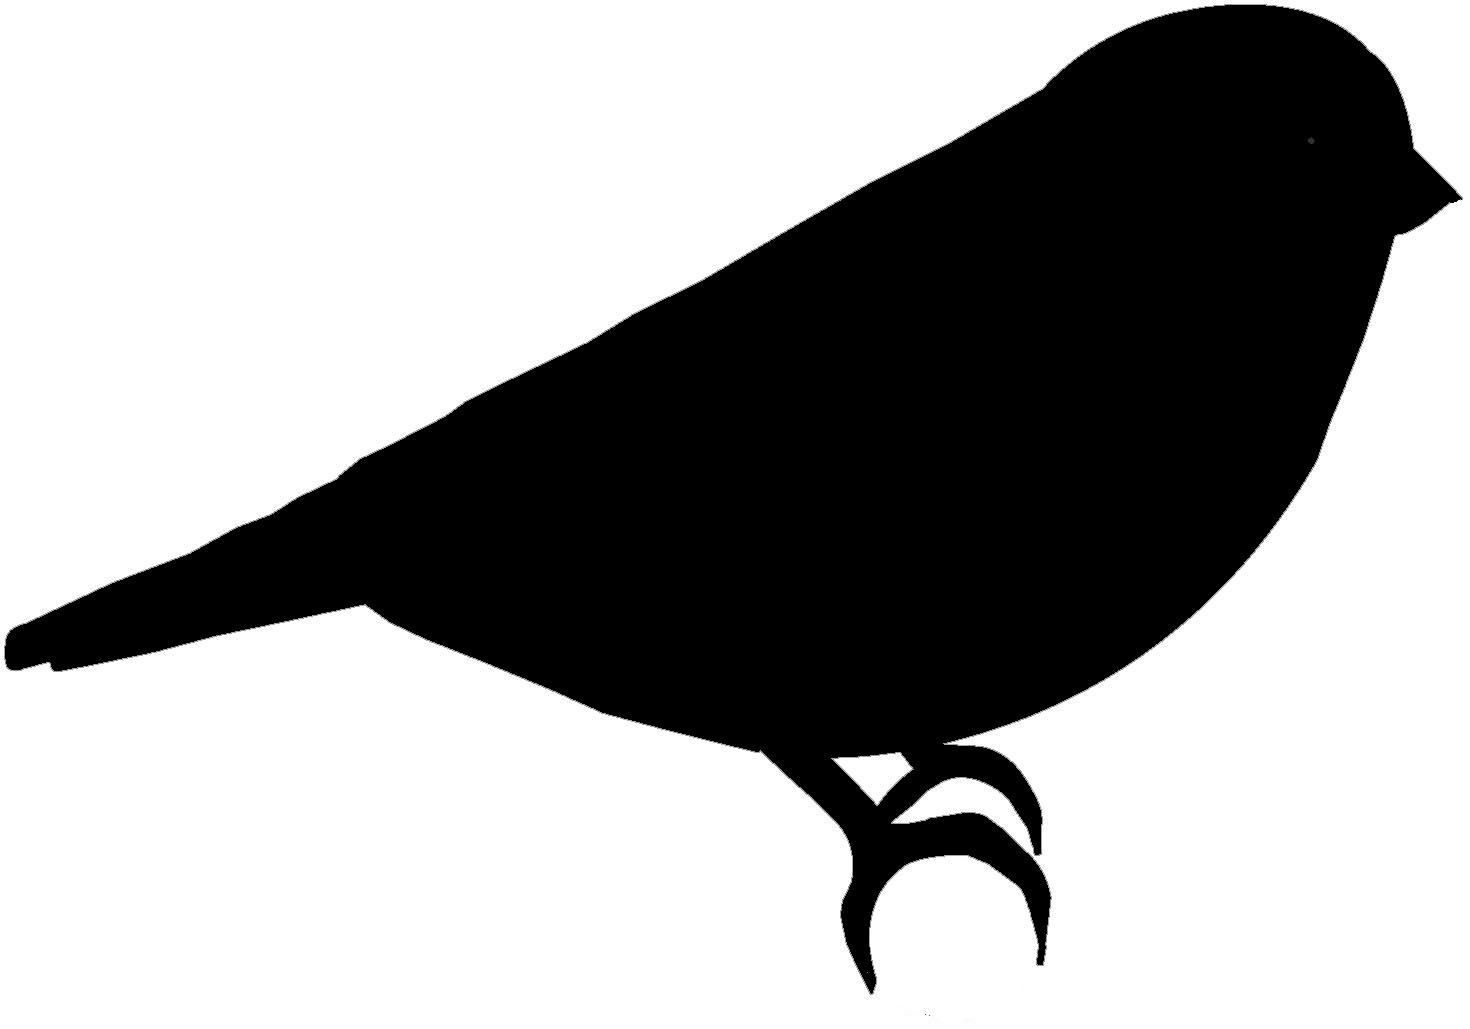 1470x1029 Best Photos Of Simple Bird Silhouette